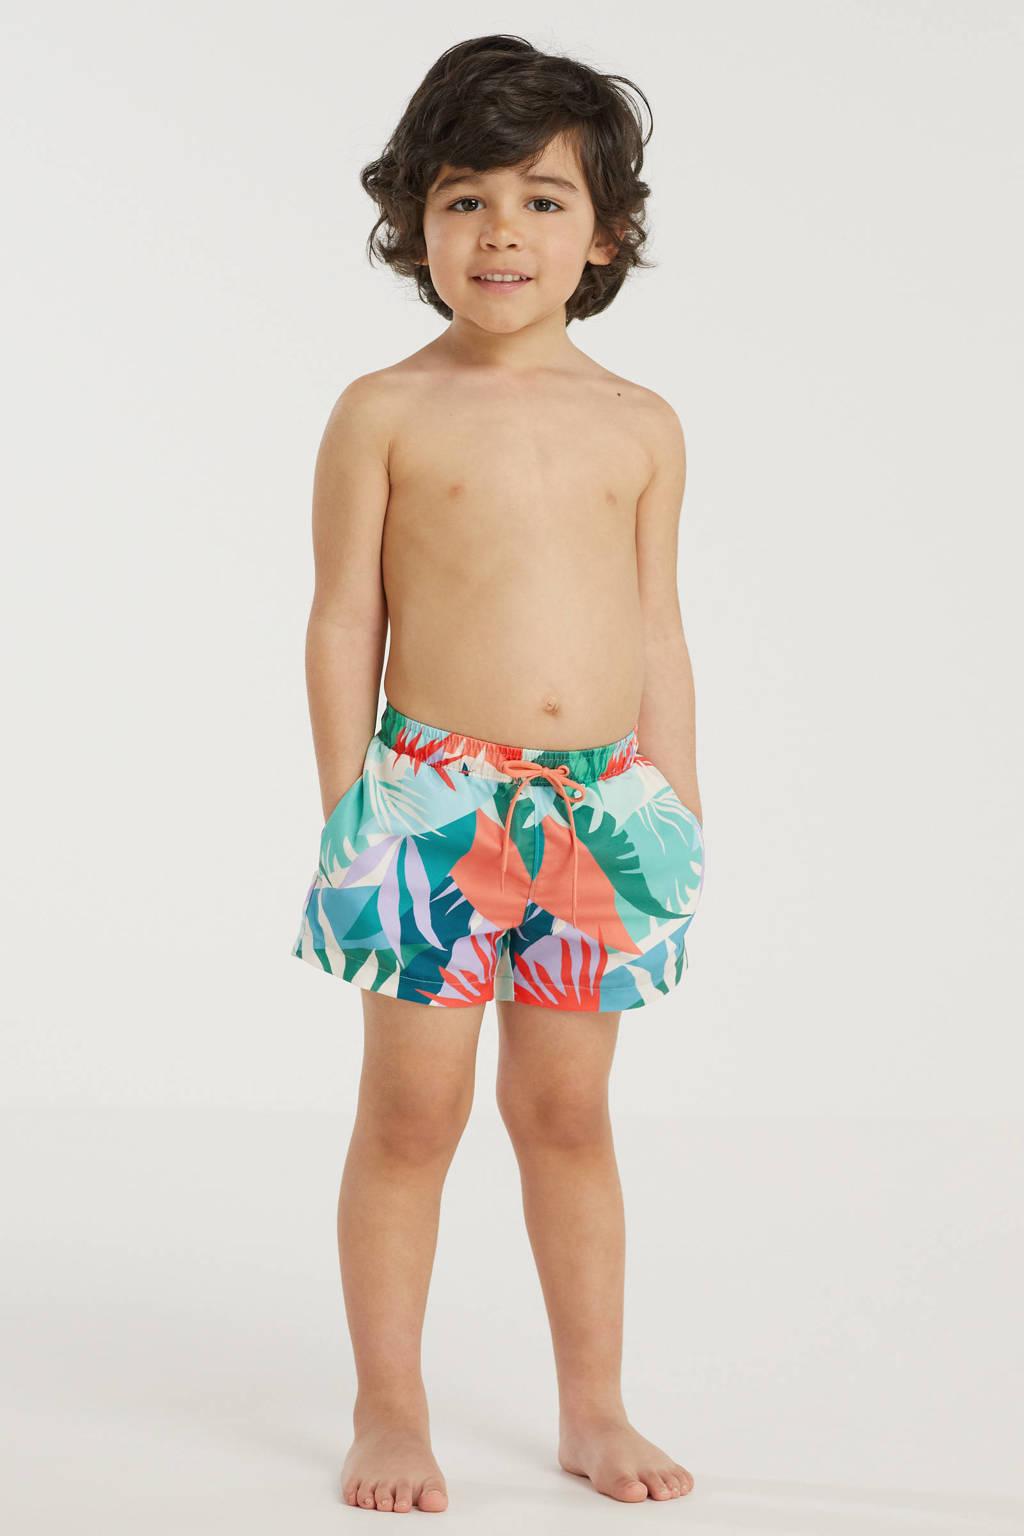 BEACHWAVE baby boys zwemshort met all over print groen/oranje, Groen/oranje